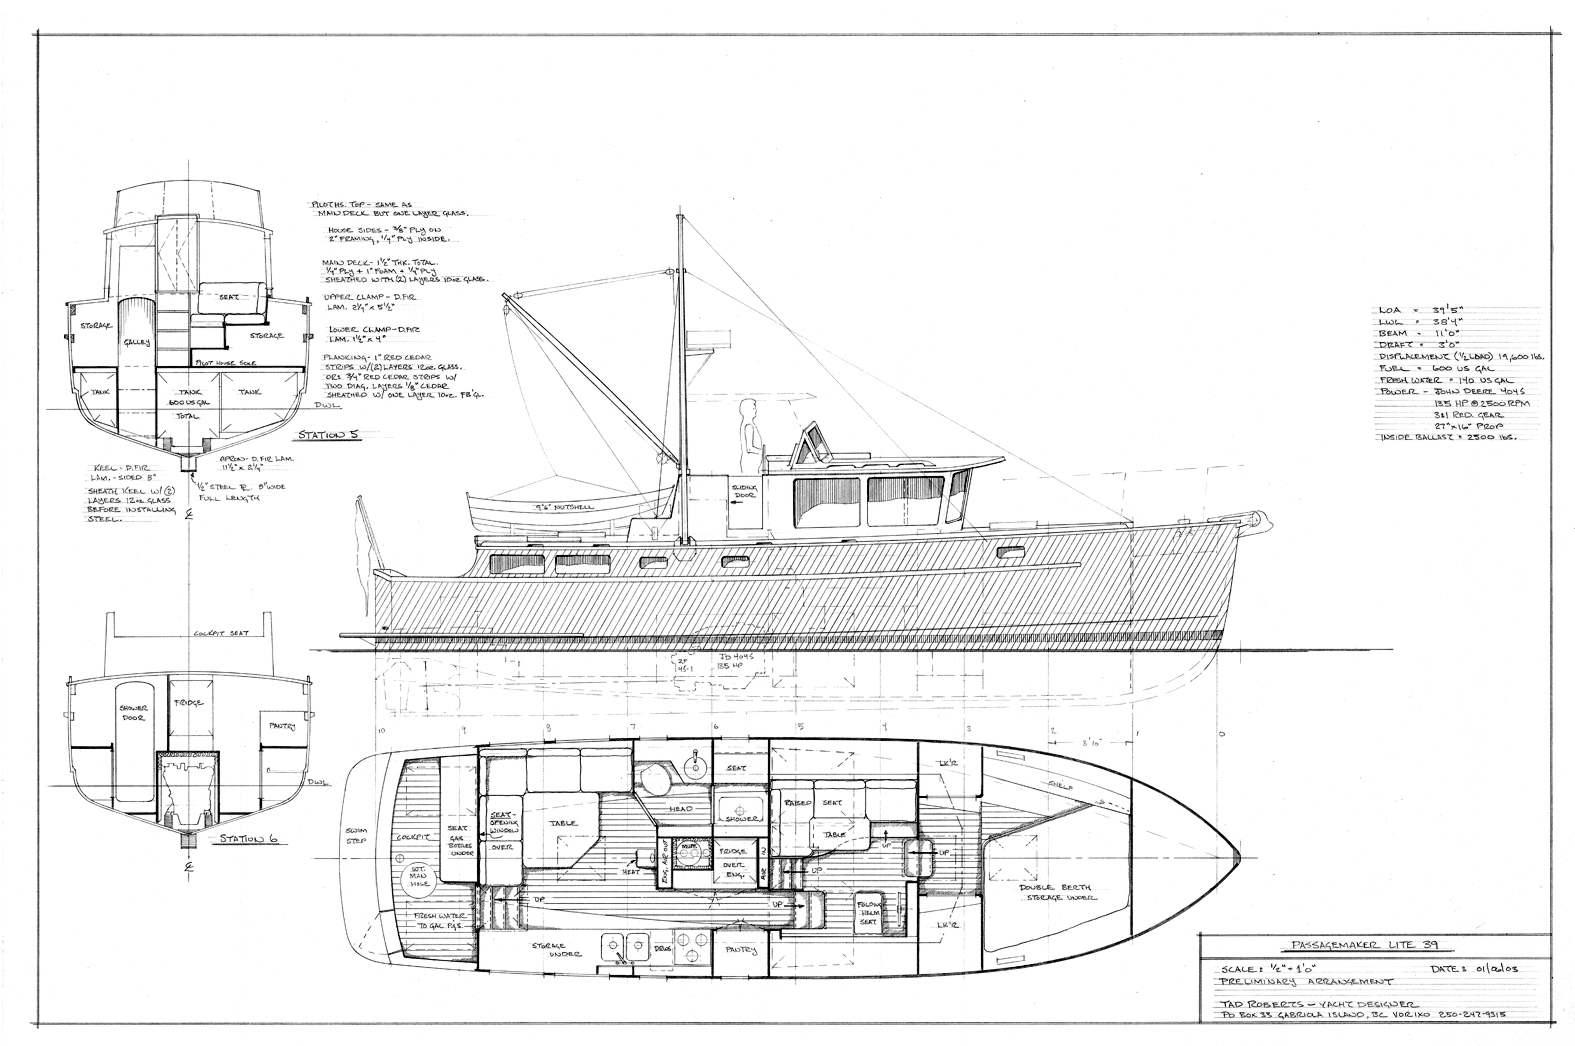 Art Line Yacht Design : Passagemaker lite tad roberts fast seaworthy fuel